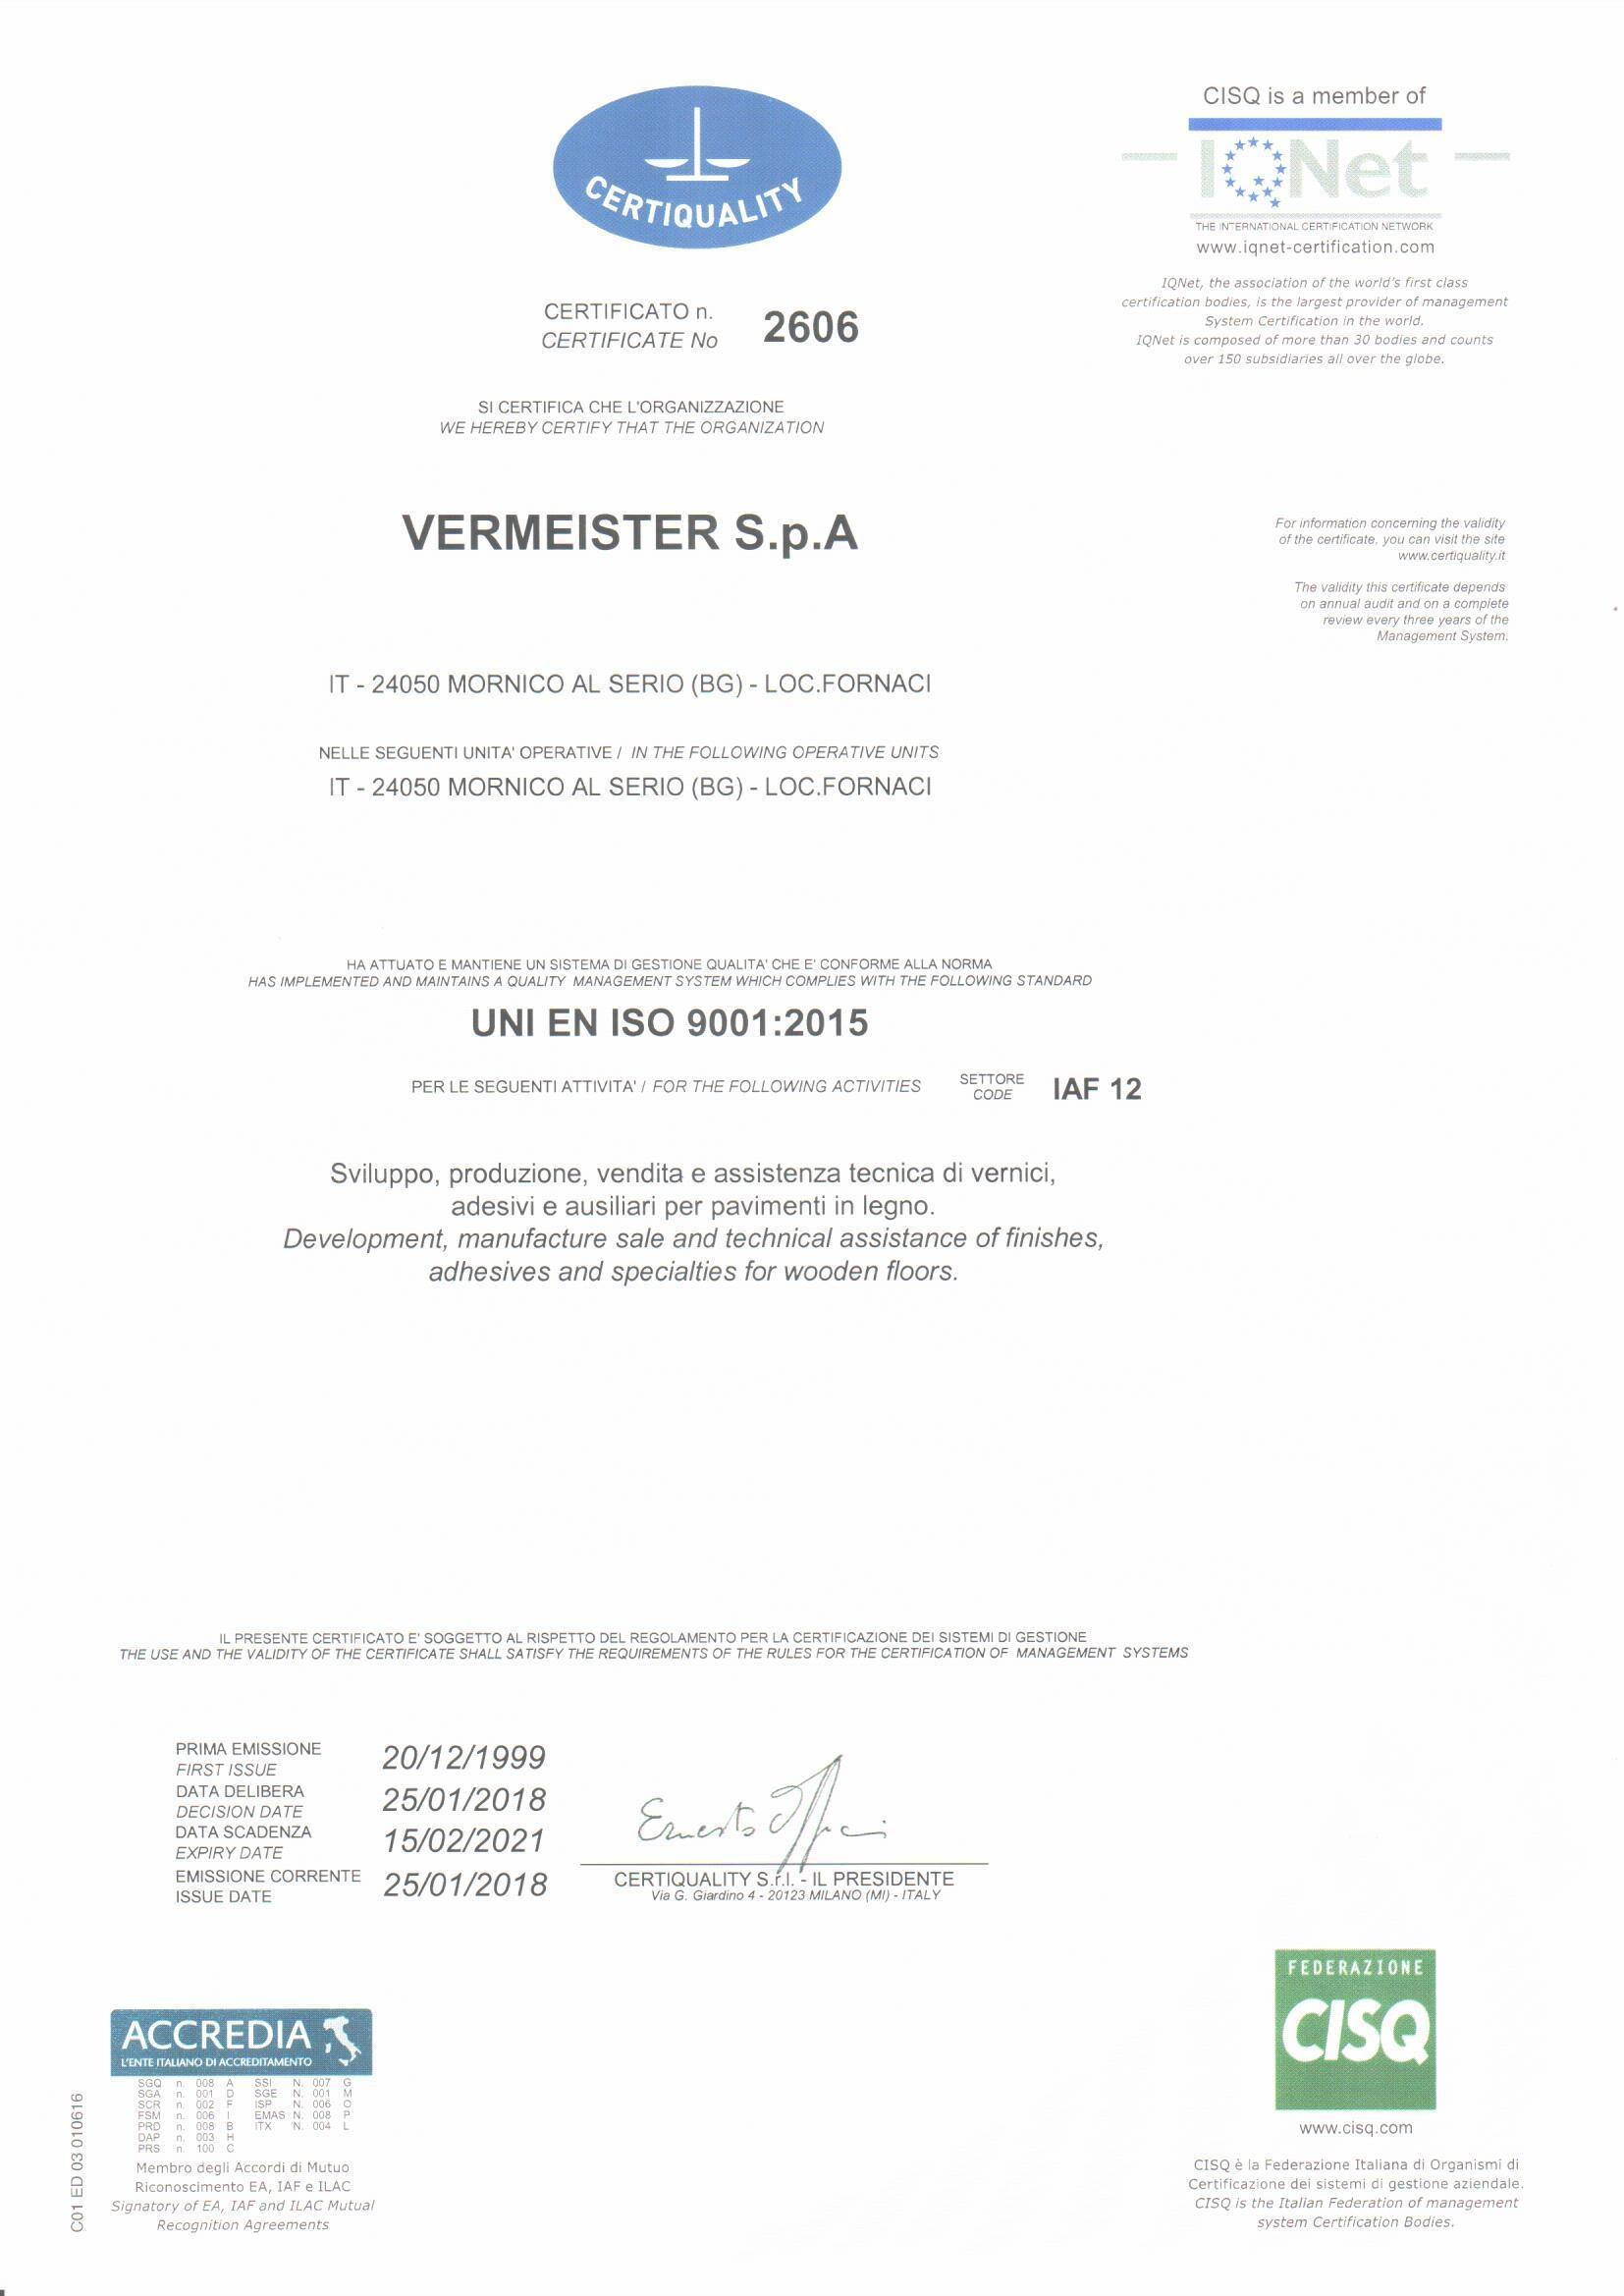 联合国欧盟ISO90012015质量管理